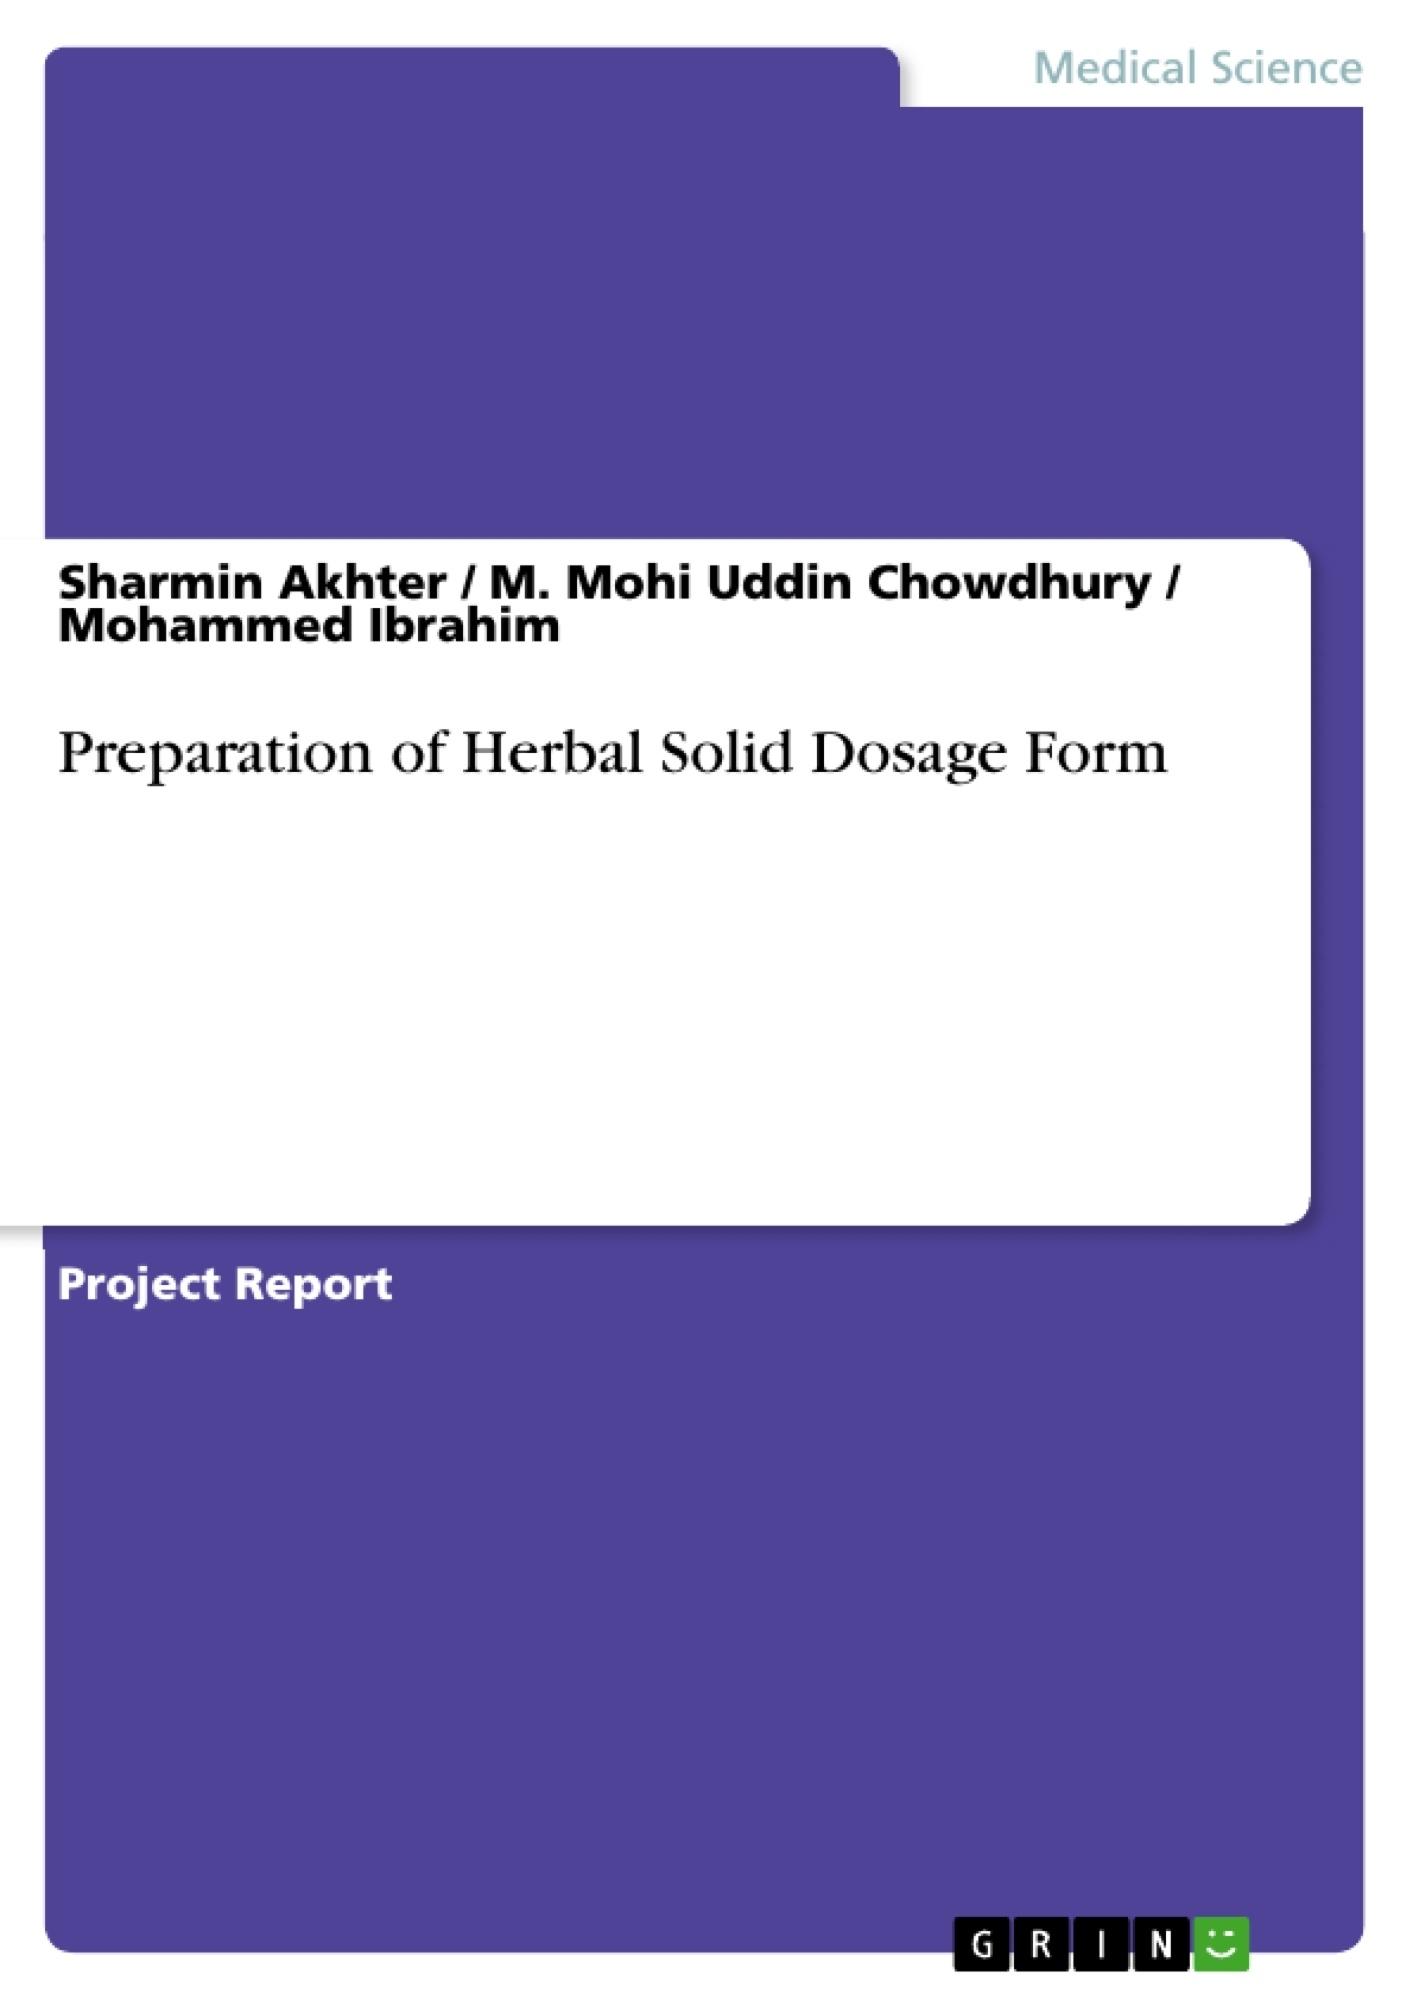 Title: Preparation of Herbal Solid Dosage Form